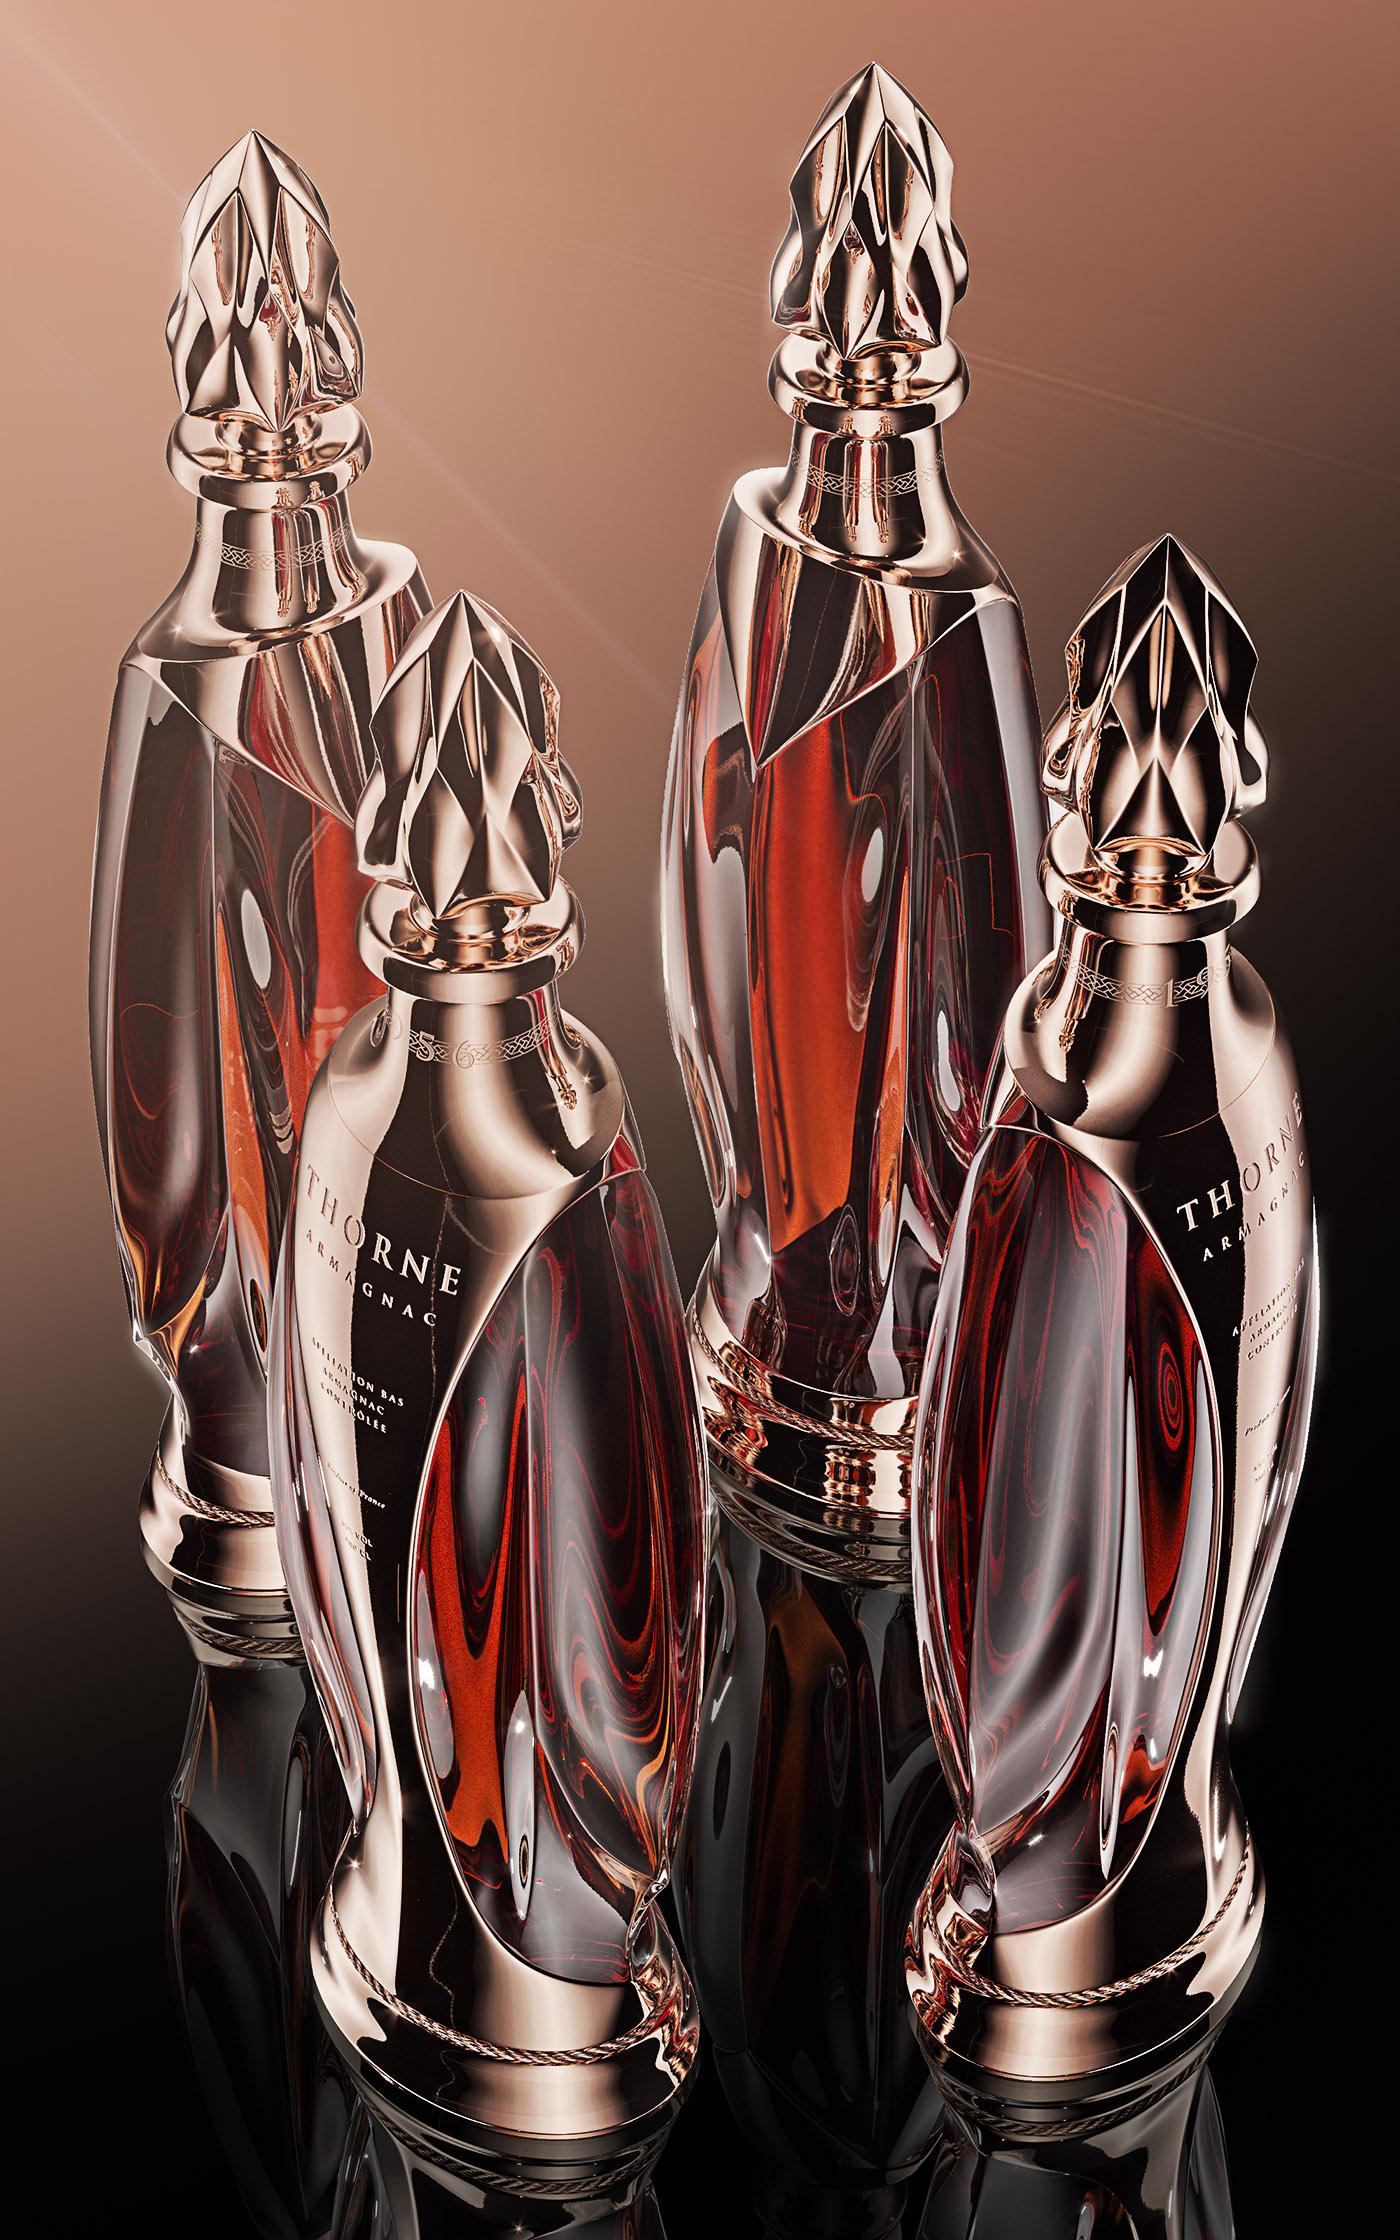 Thorne luxury armagnac bottle 5.jpg